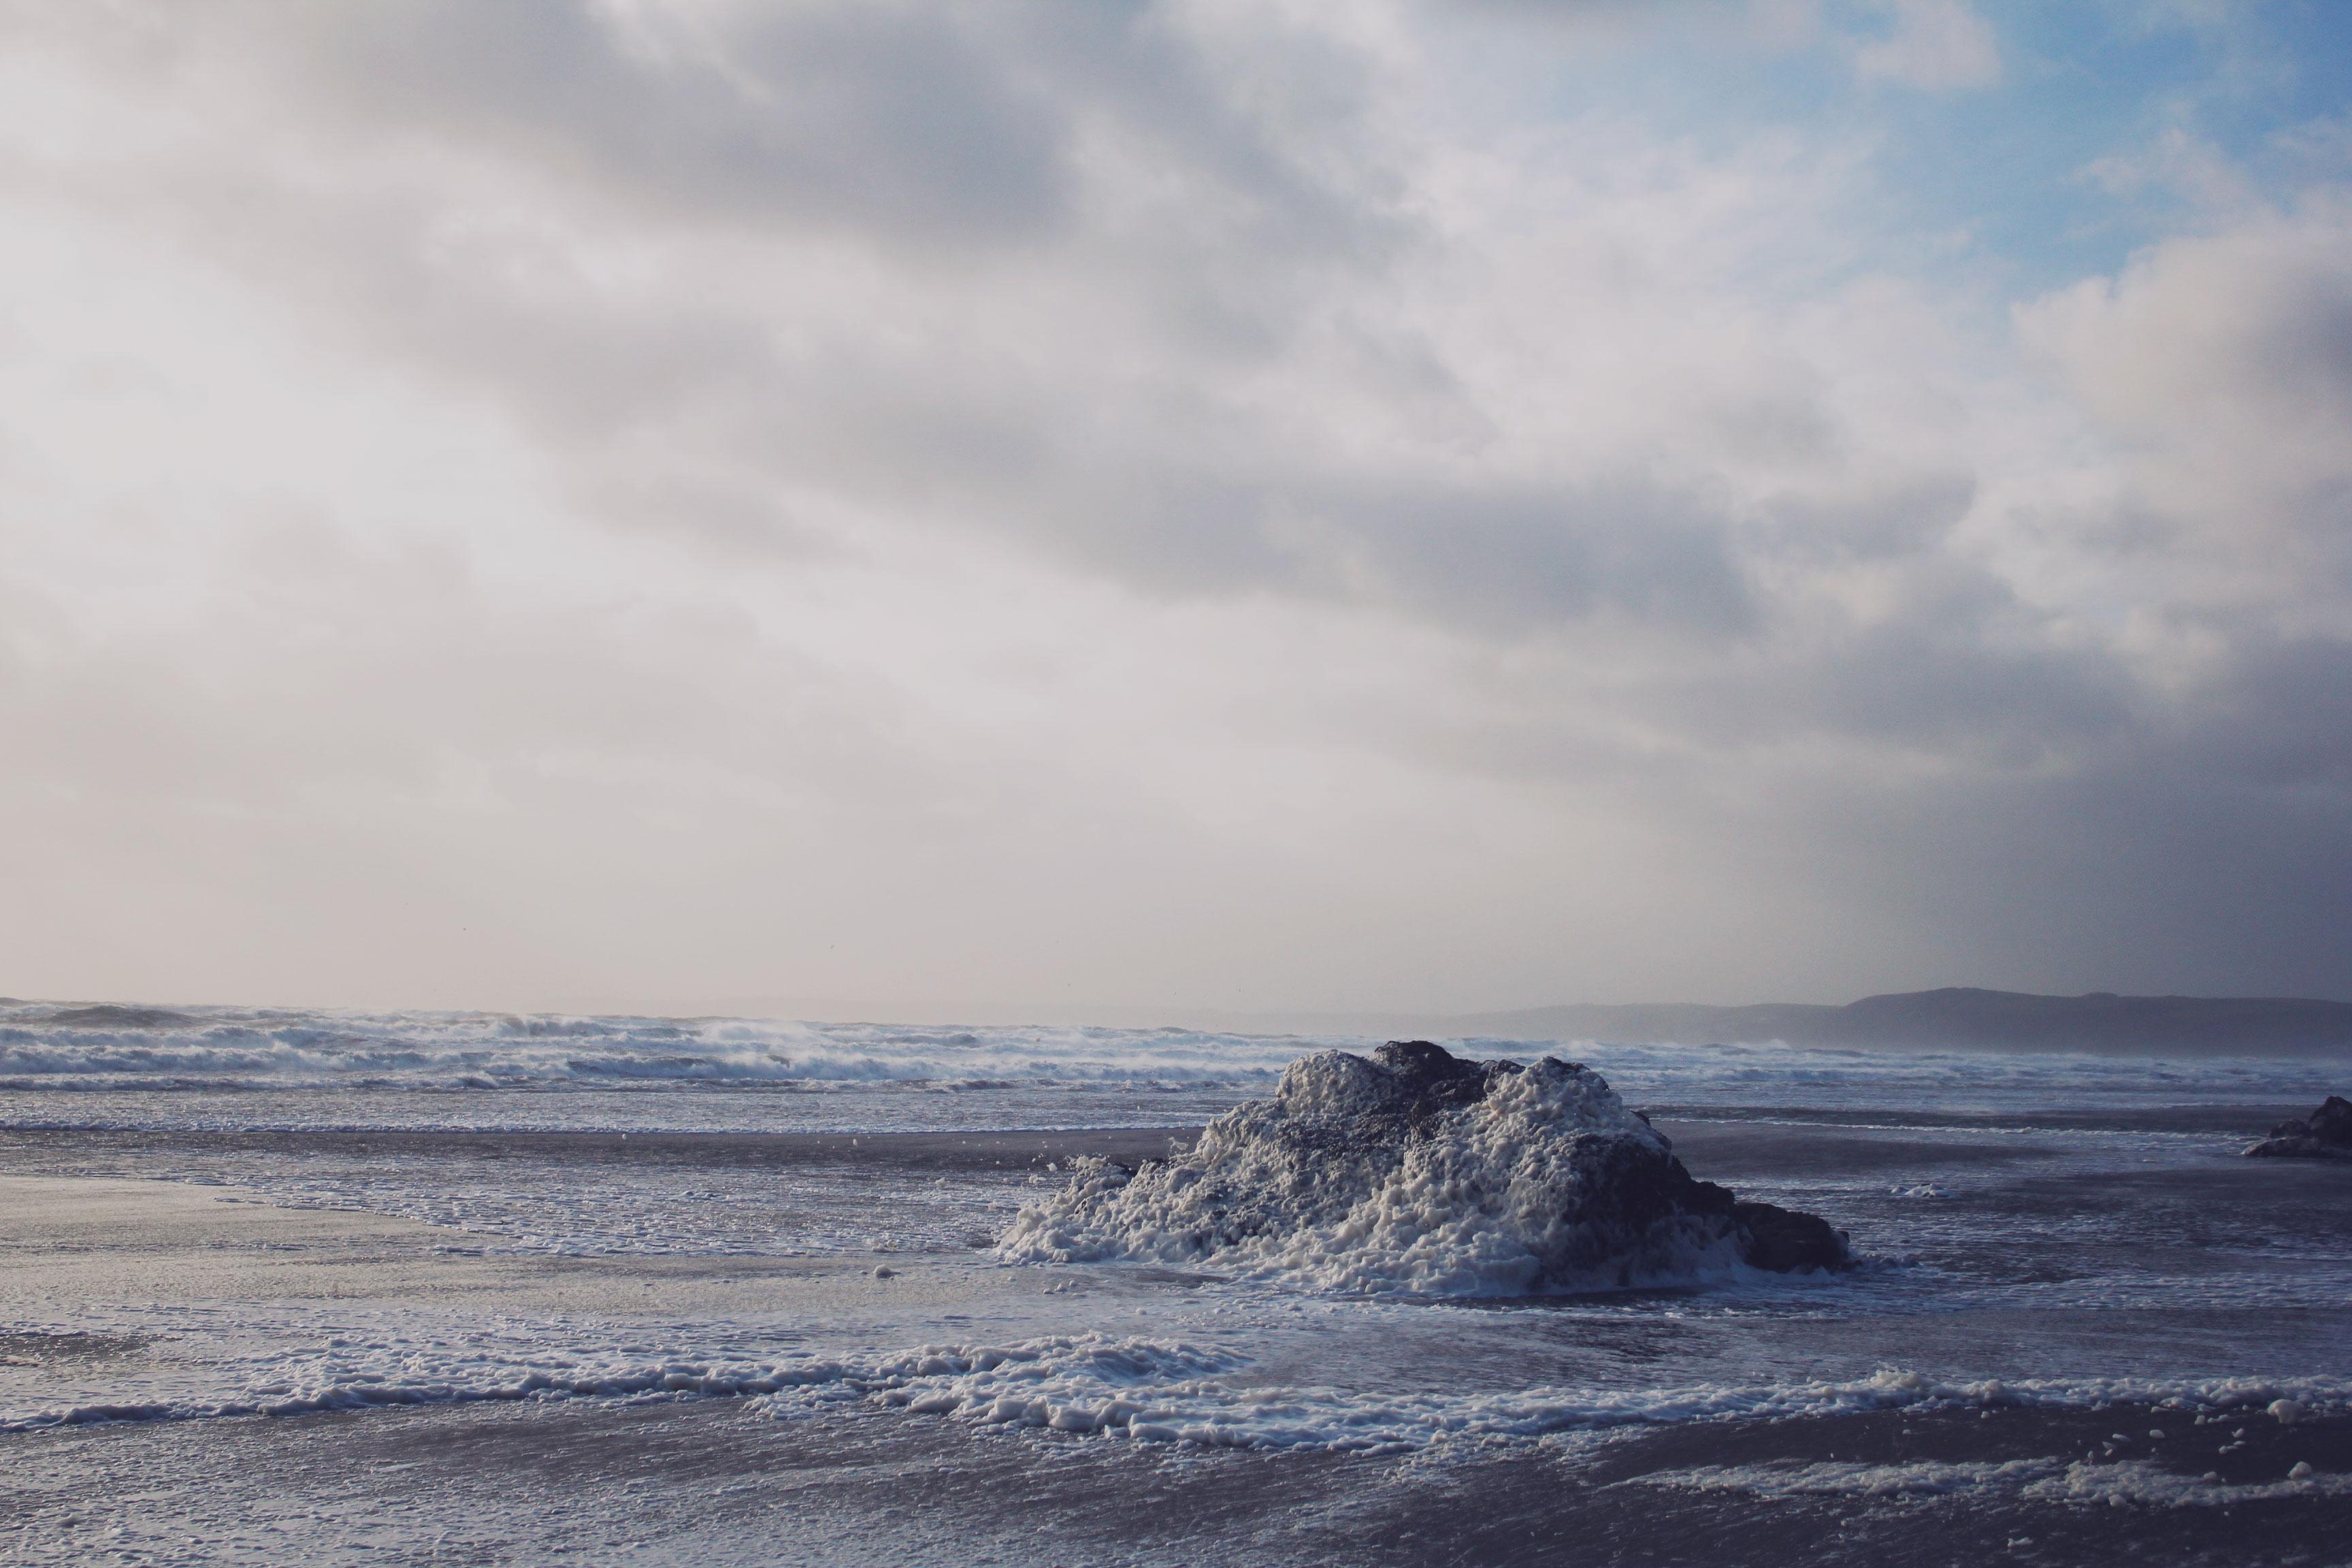 Sea foam on the rocks at Whitsand Bay, Cornwall